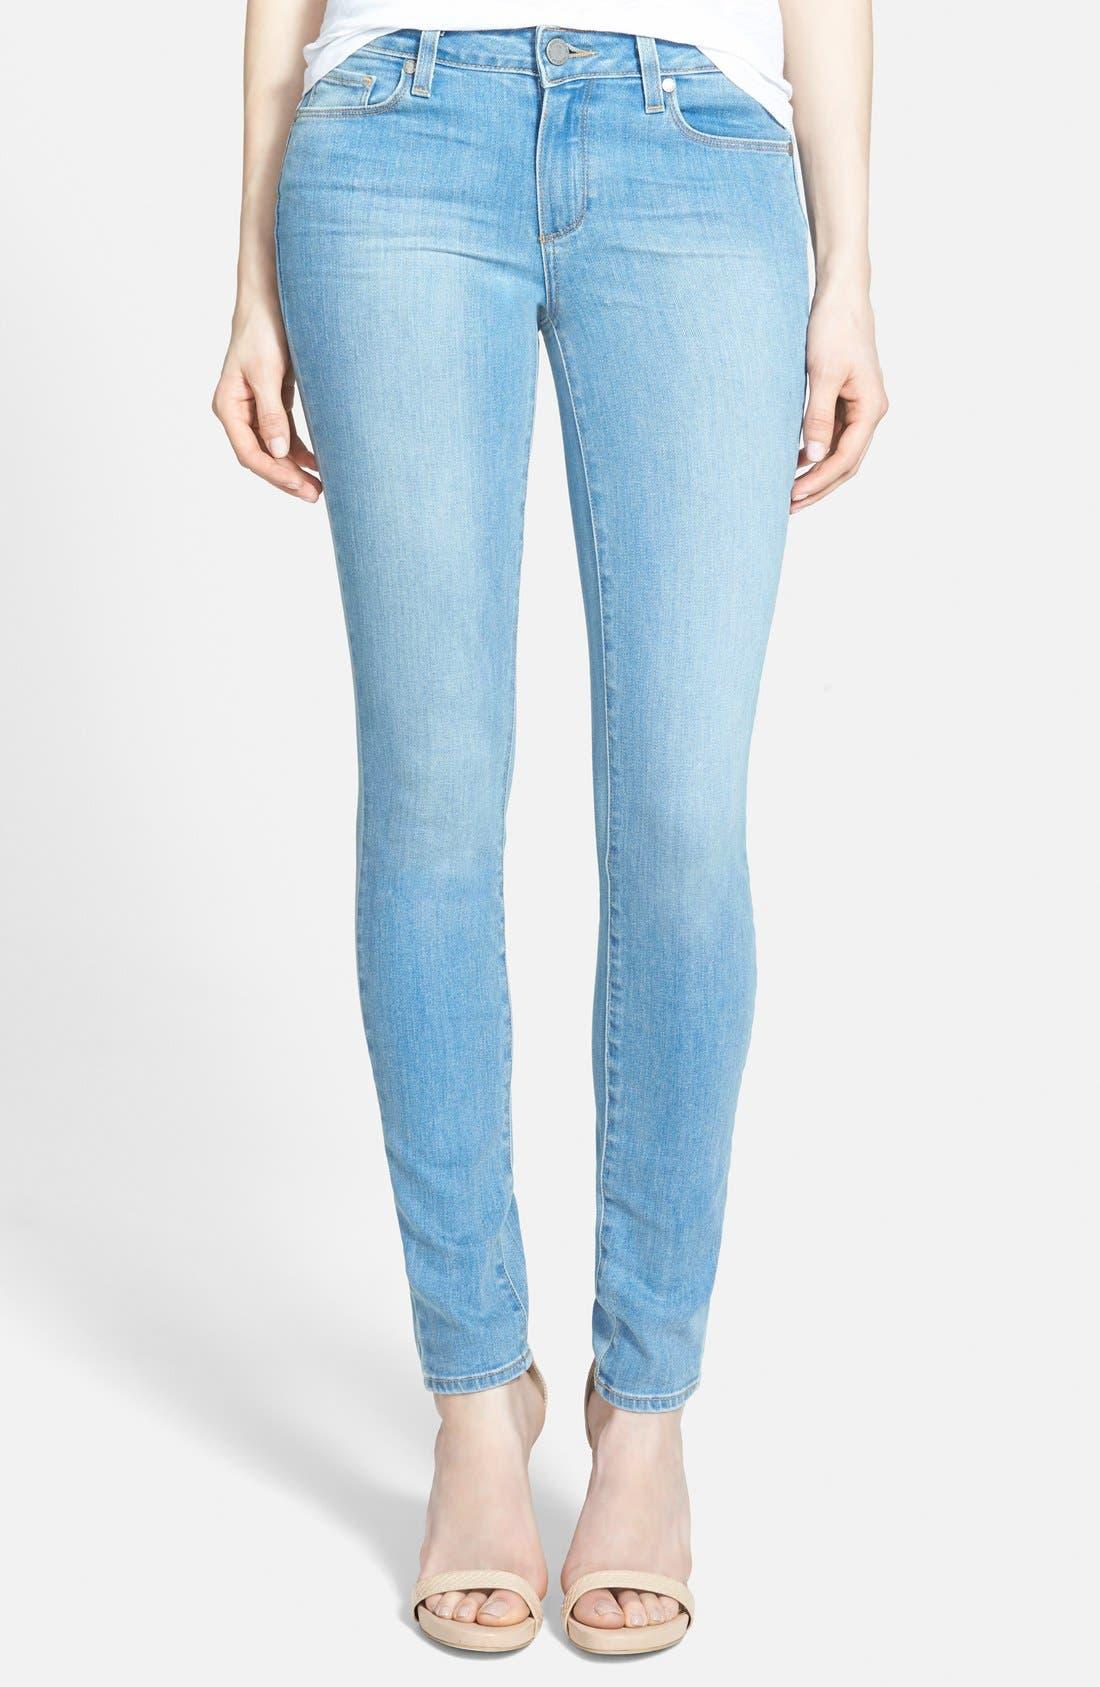 Alternate Image 1 Selected - Paige Denim 'Verdugo' Ultra Skinny Jeans (Maddie)